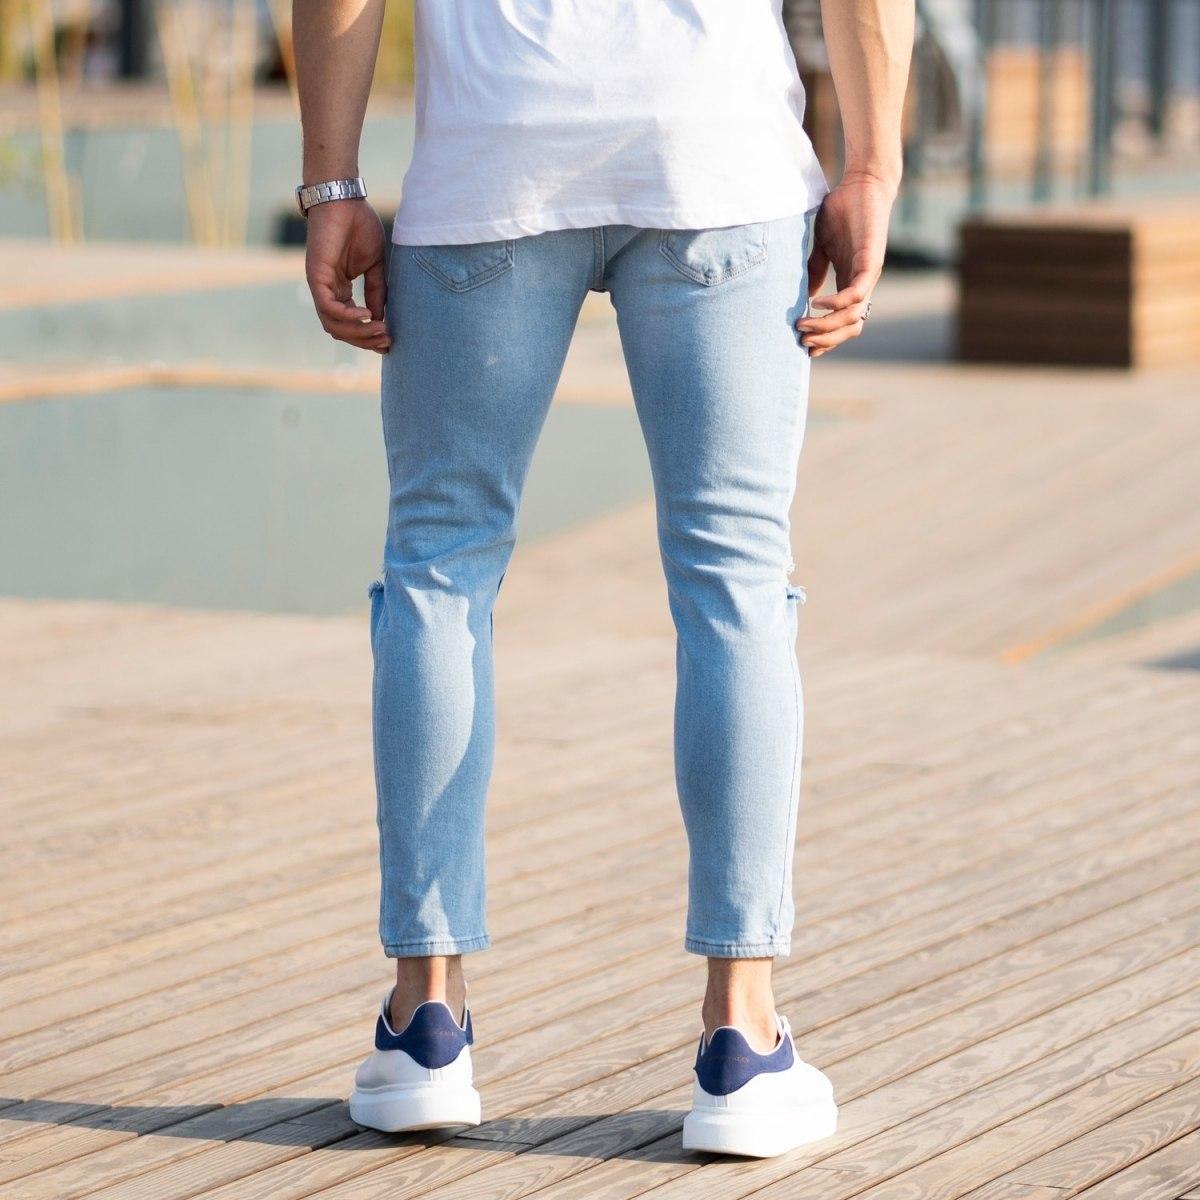 Men's Light-Blue Jeans With Rips Mv Premium Brand - 3